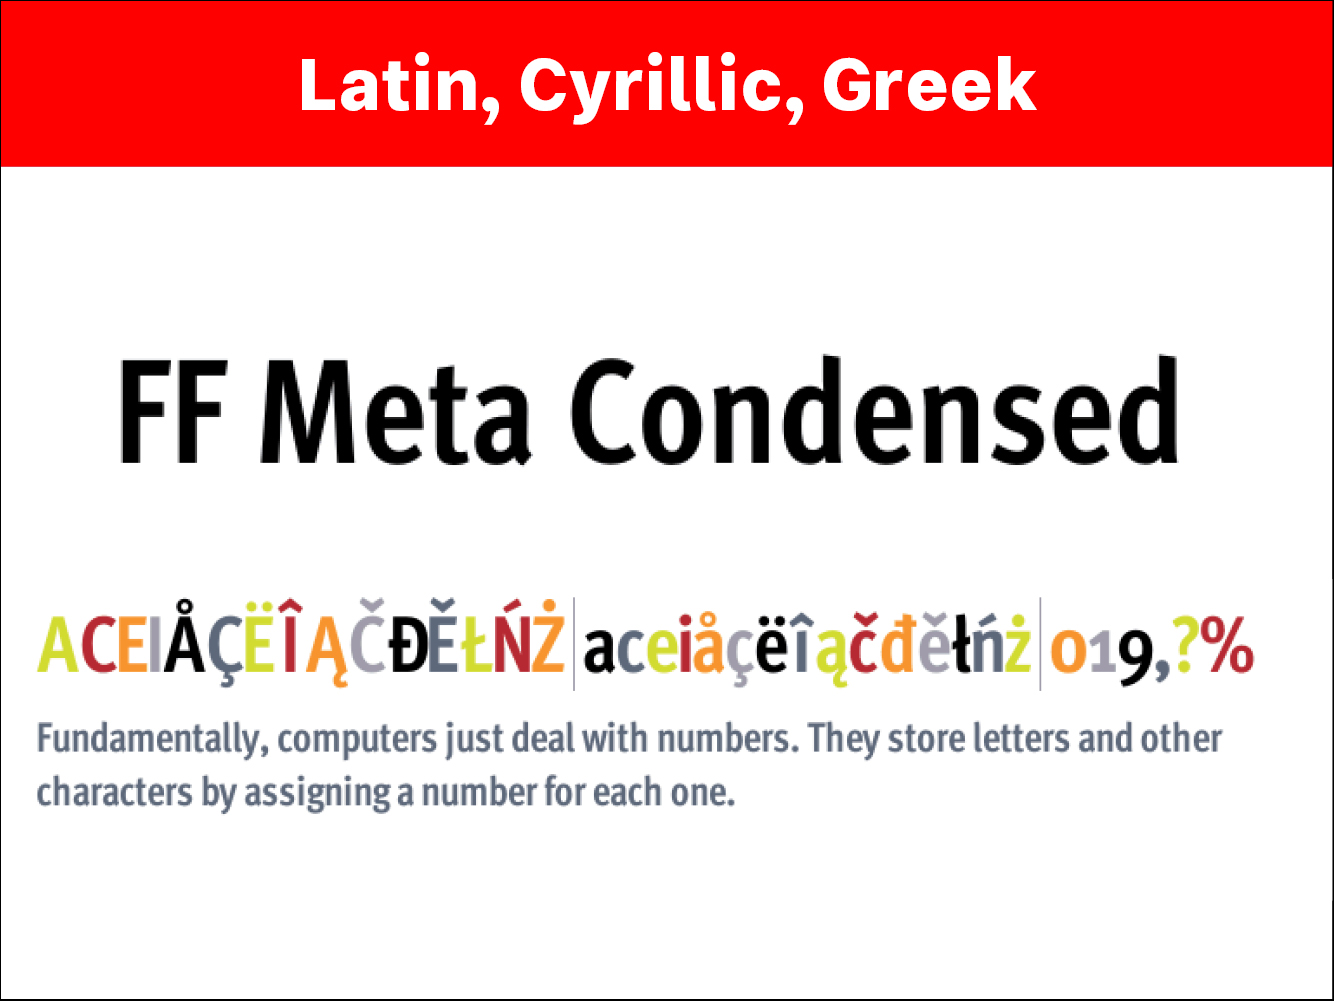 FF Meta Condensed